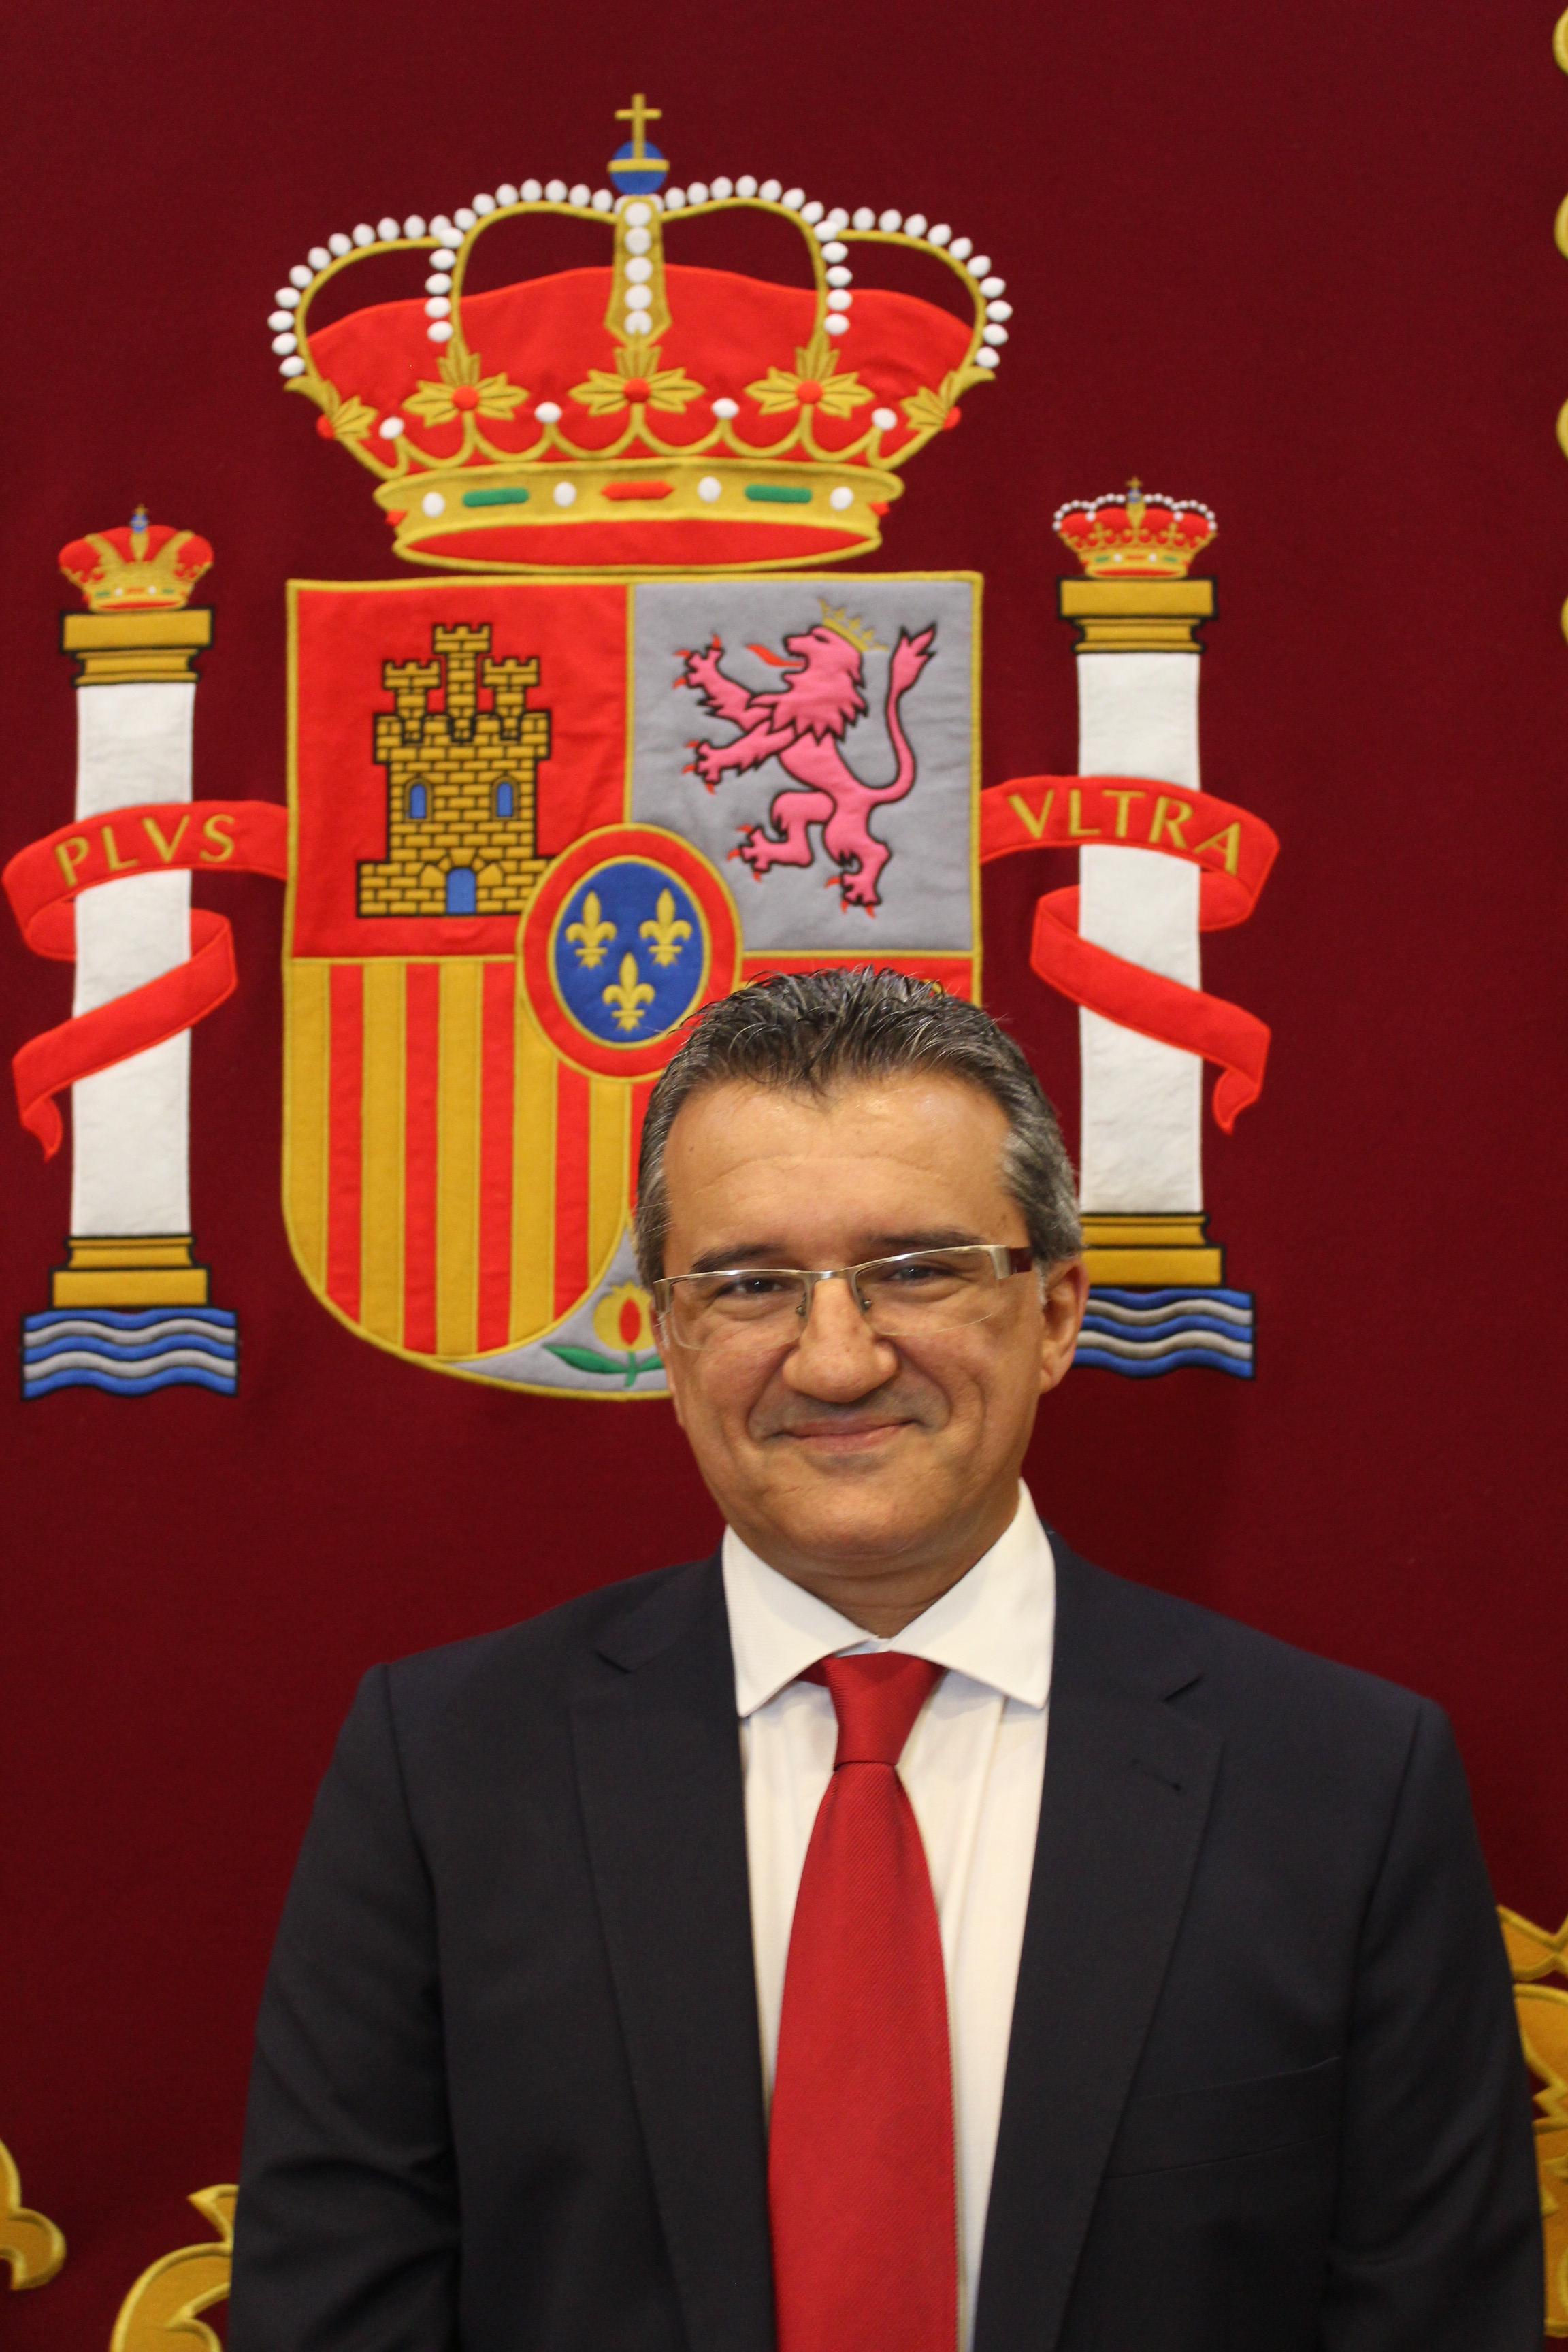 20. Francisco Javier Caravias Chaves Adelante Alhaurín de la Torre